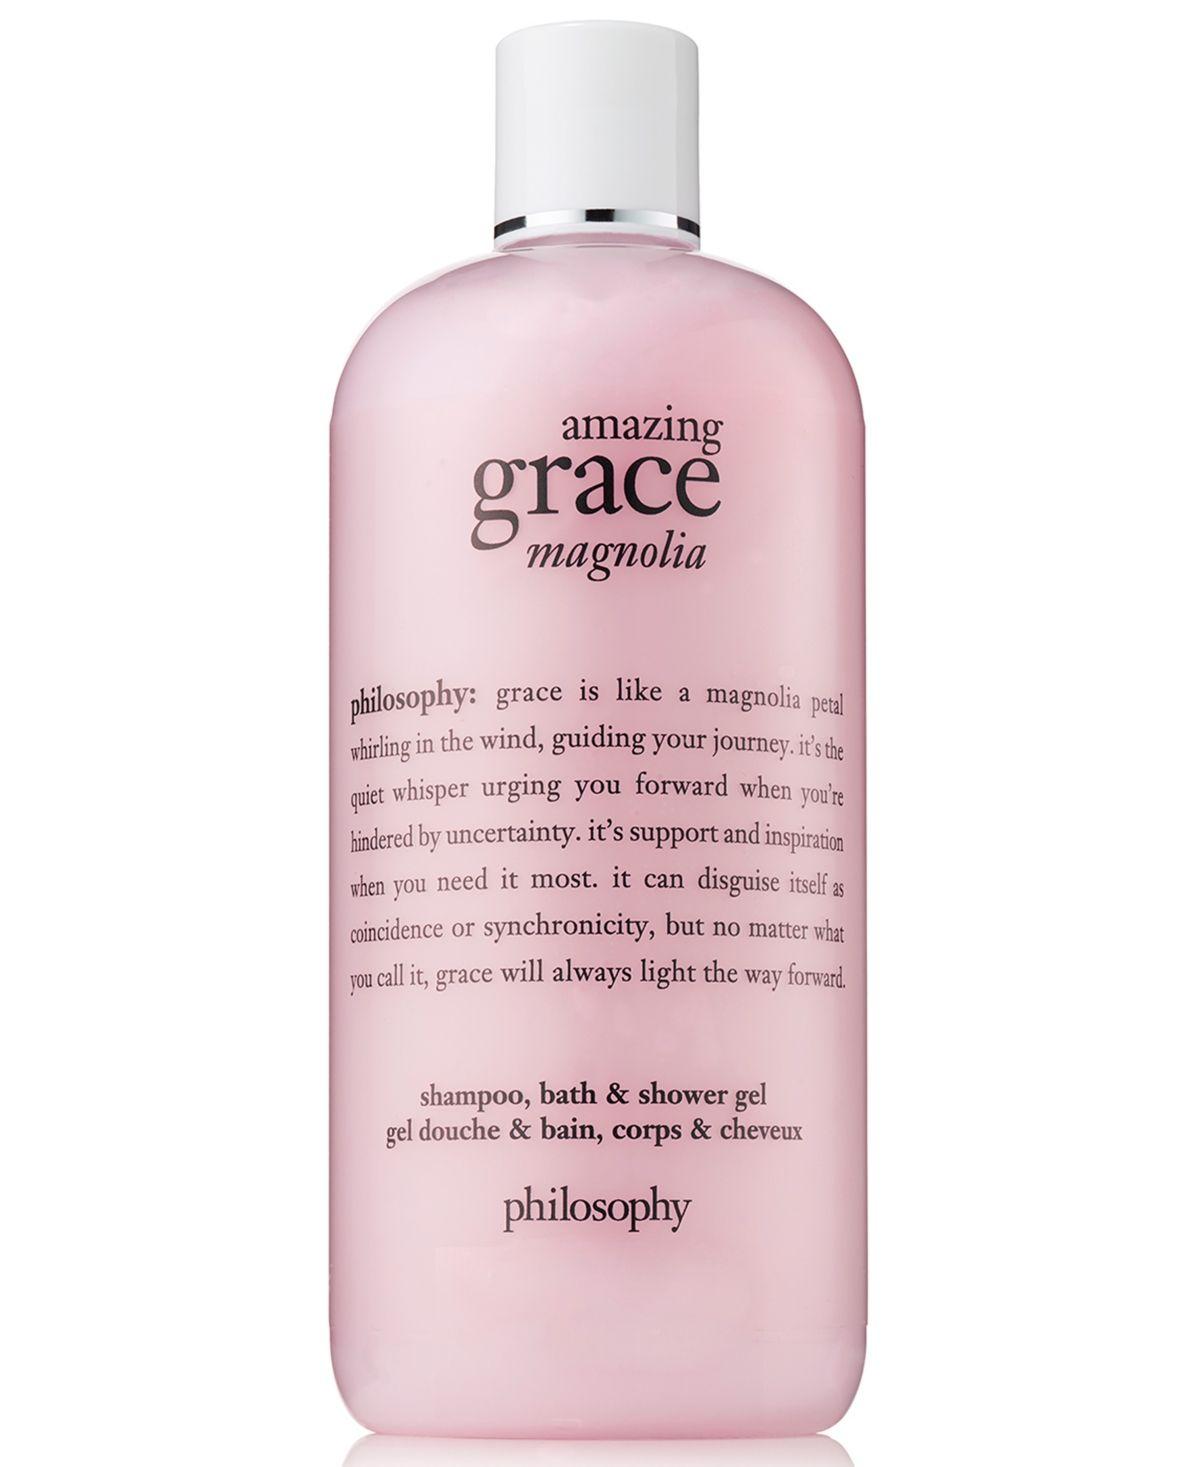 Philosophy Amazing Grace Magnolia Shampoo Bath Shower Gel 16 Oz Reviews Beauty Macy S Philosophy Amazing Grace Shower Gel Amazing Grace